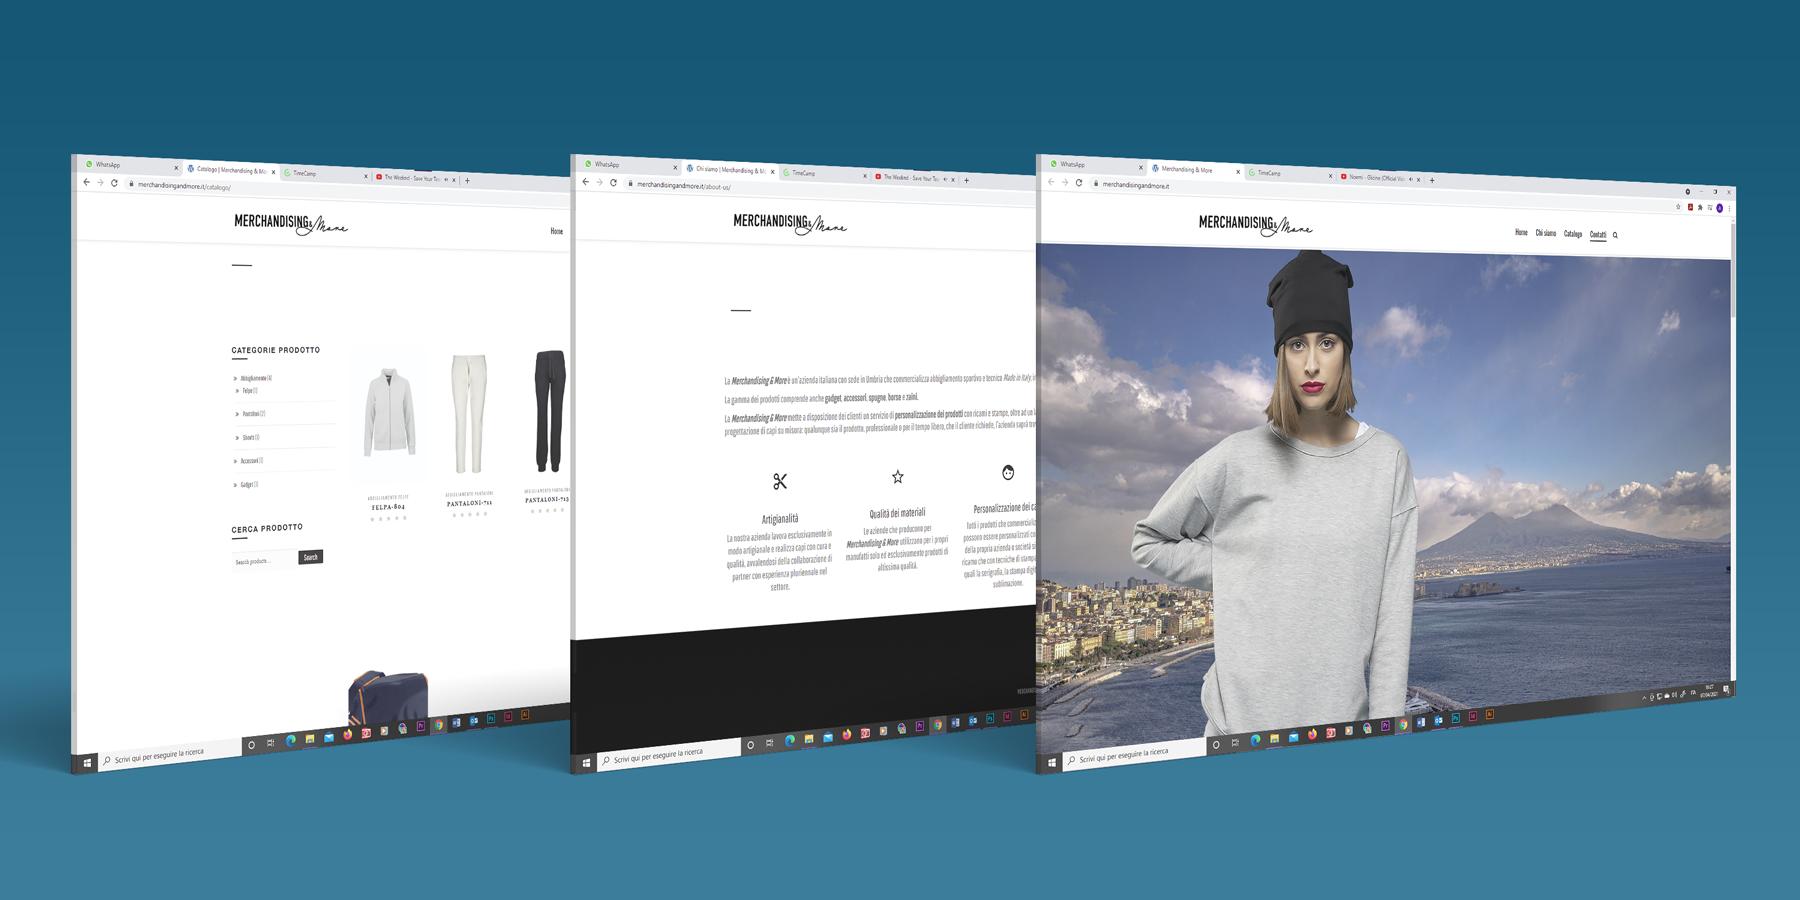 Merchandising and more - screen